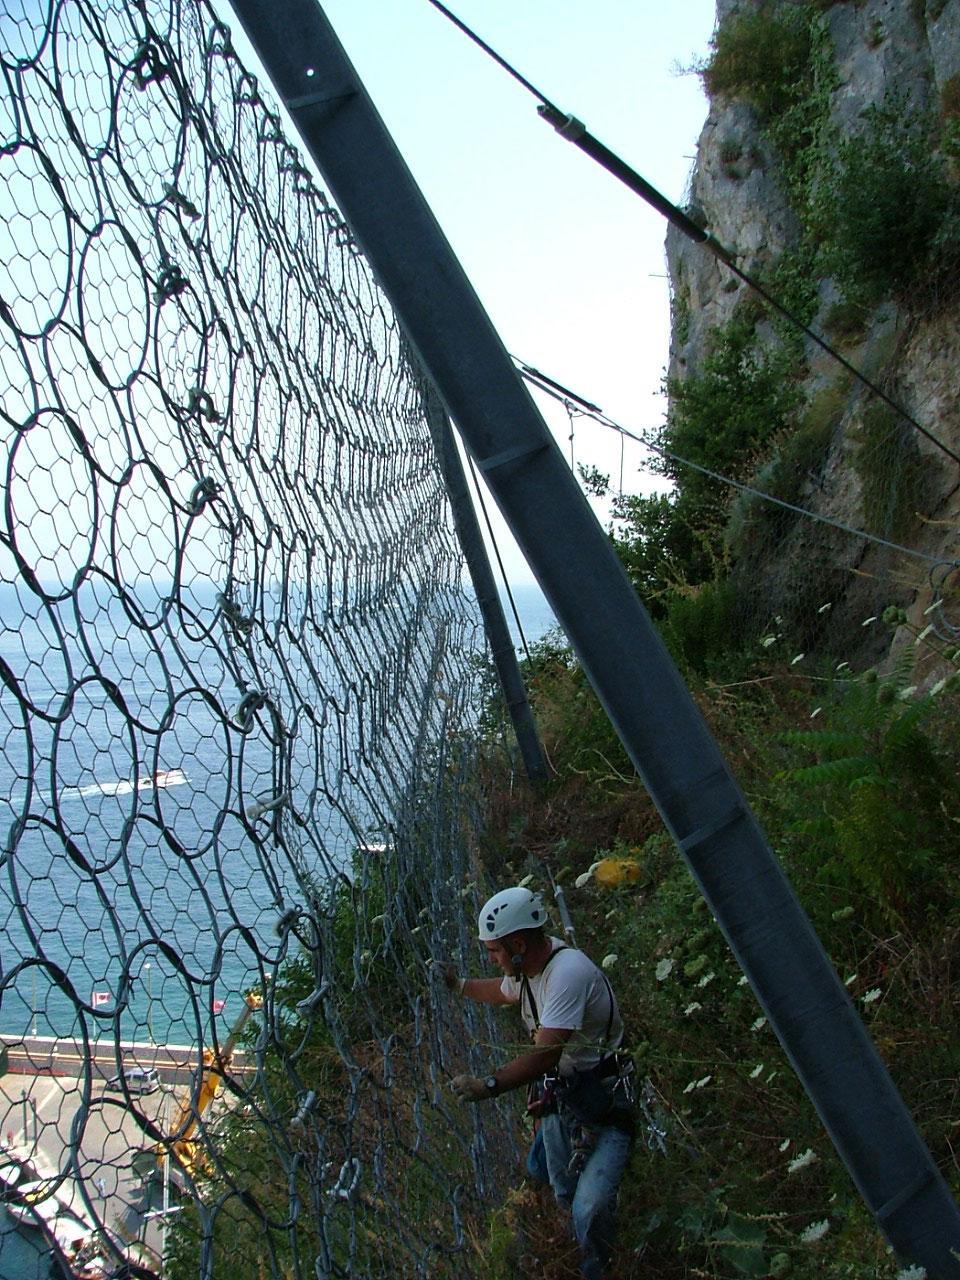 http://www.geoinformatica.it/wp-content/uploads/2015/07/direzione-lavori5.jpg